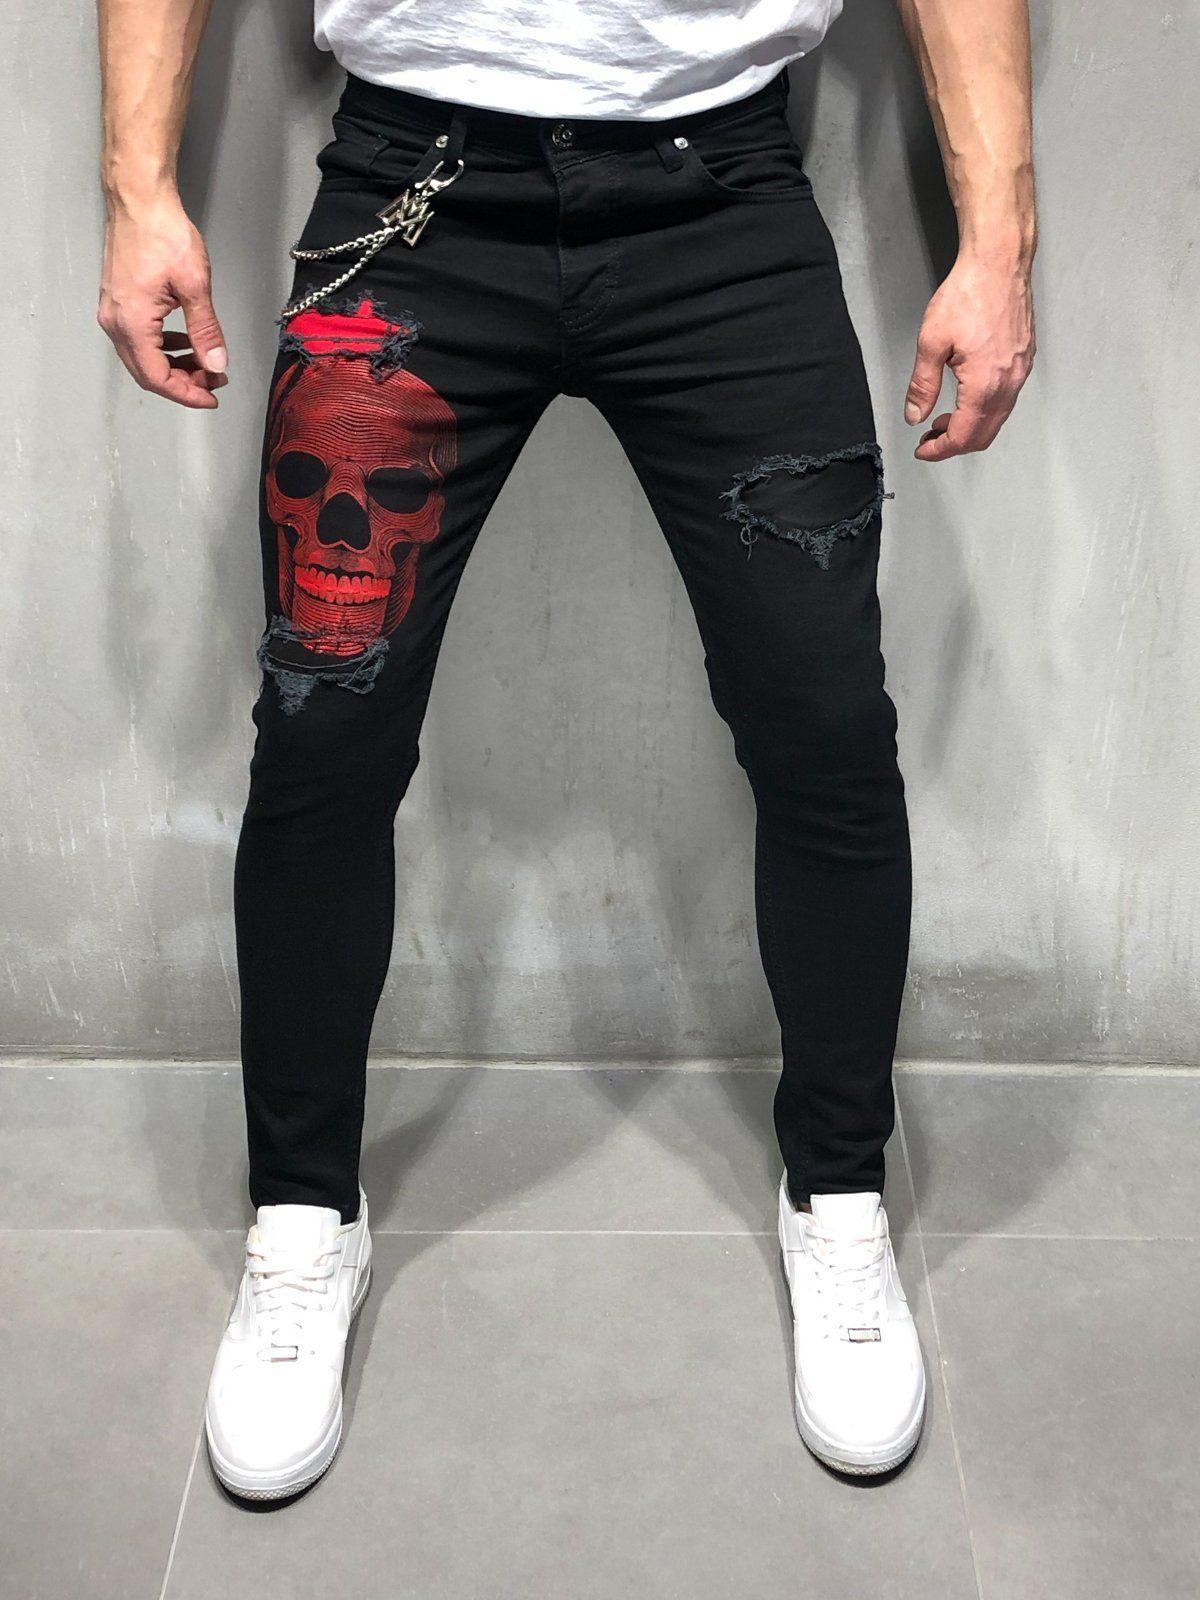 55bdb45a4 Black Jeans Red Skull Print in 2019 | haine | Denim jeans men, Black ...